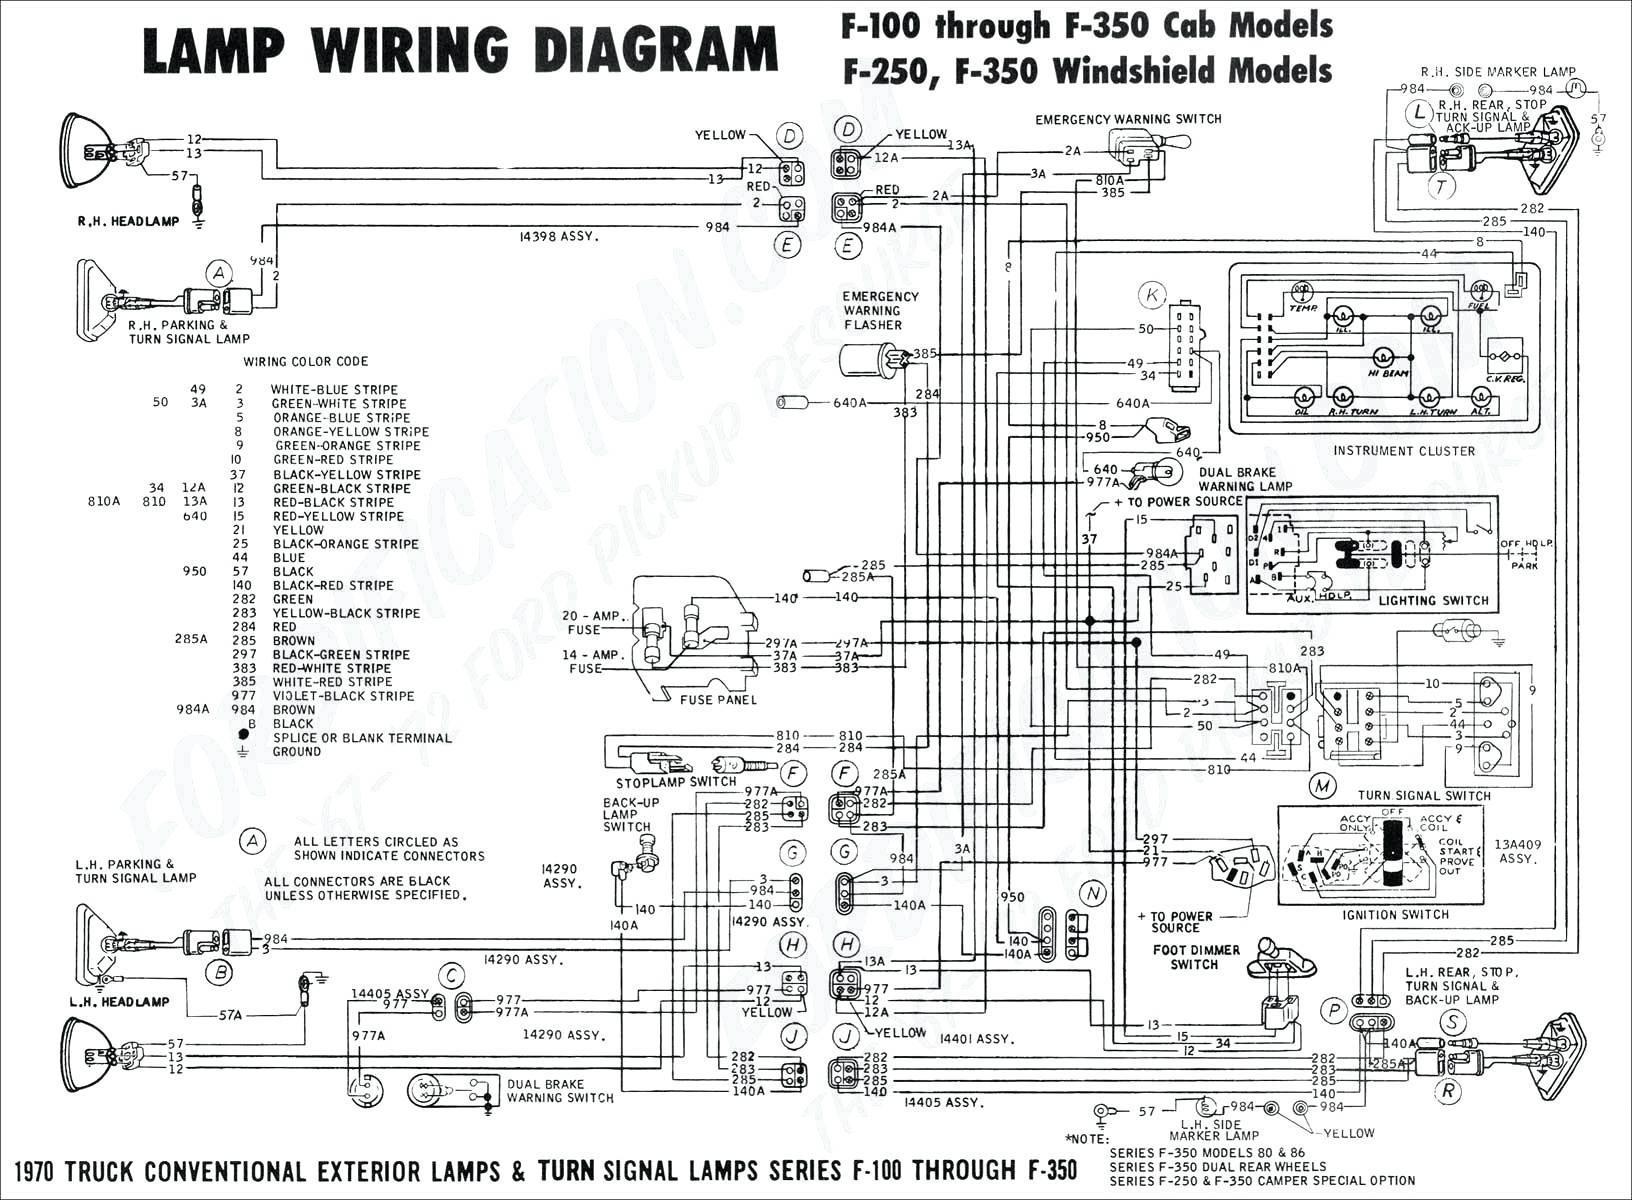 1998 Toyota Corolla Fuse Diagram Wiring Diagram Centre 2010 Toyota Corolla Radio Fuse Location 2010 Toyota Corolla Fuse Diagram